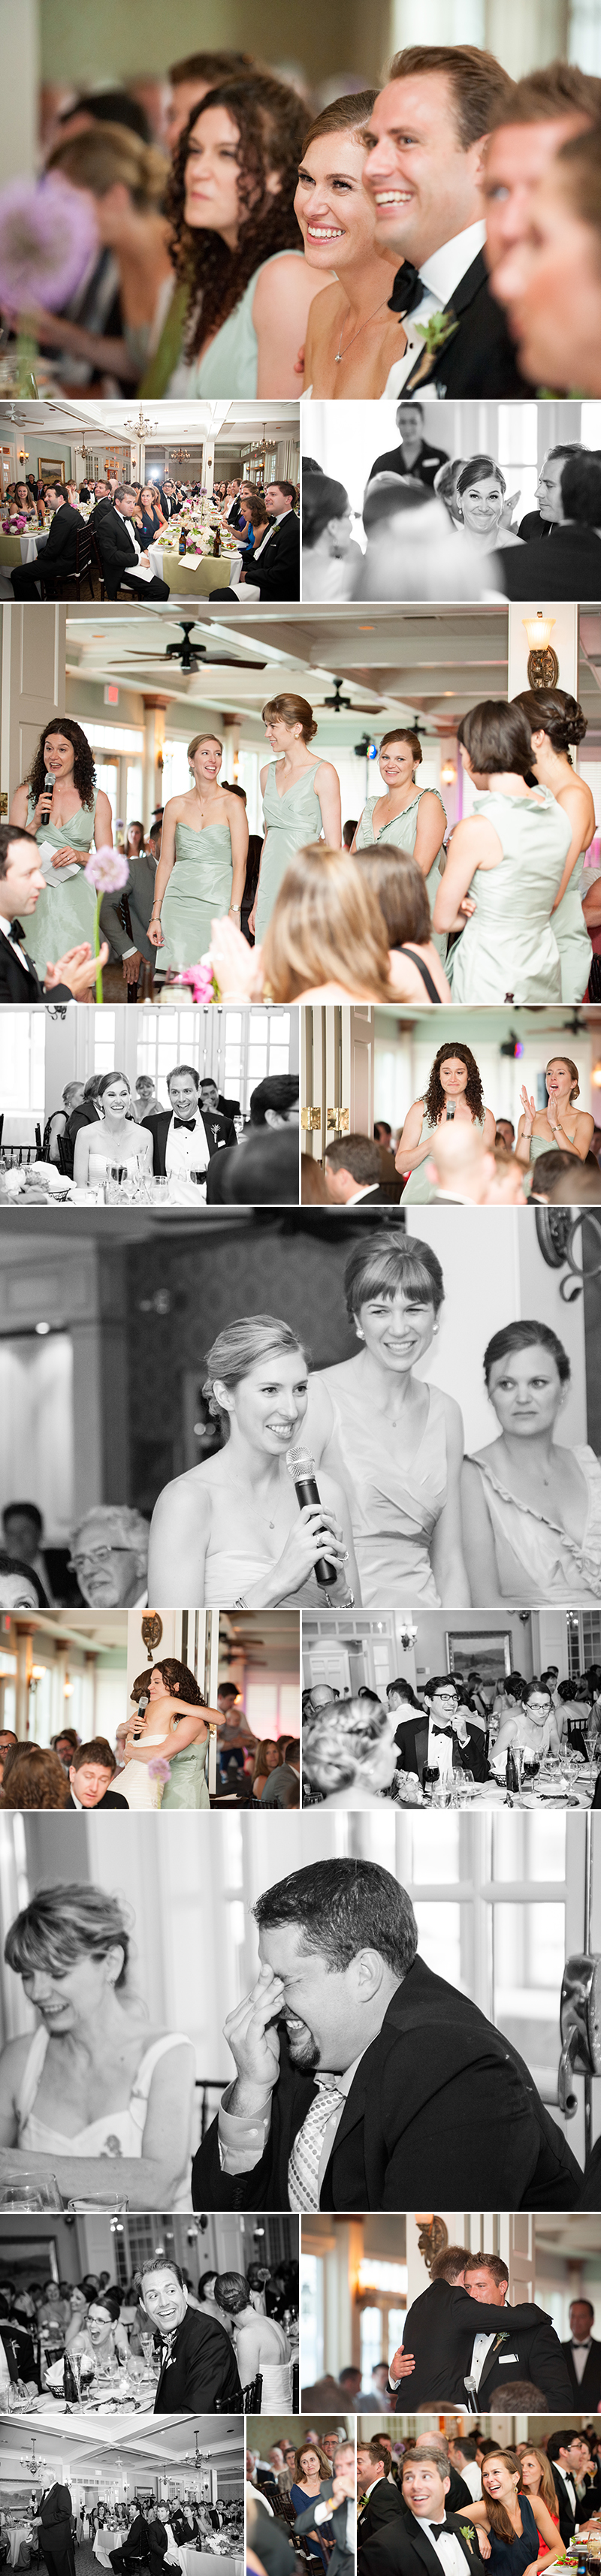 Blog Collage-1395770668296